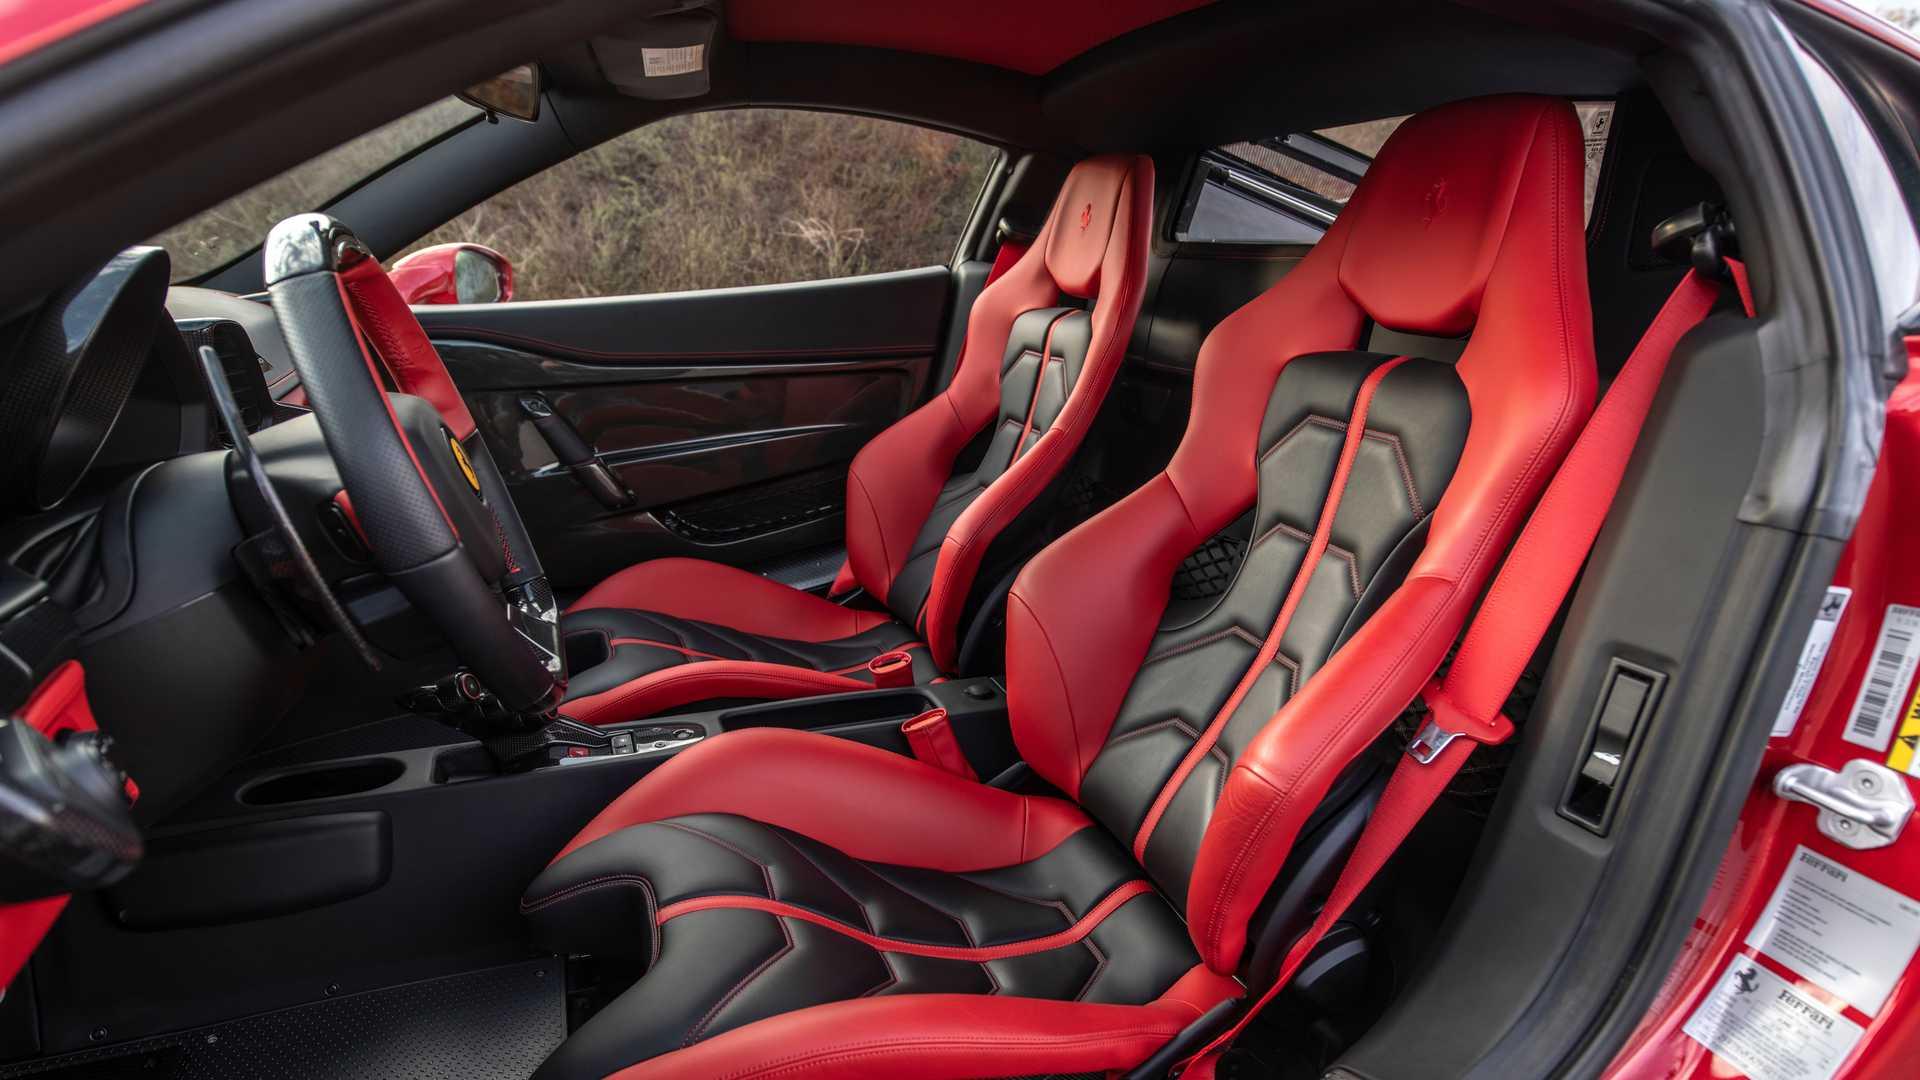 Bulletproof Ferrari 458 Speciale By AddArmor Interior